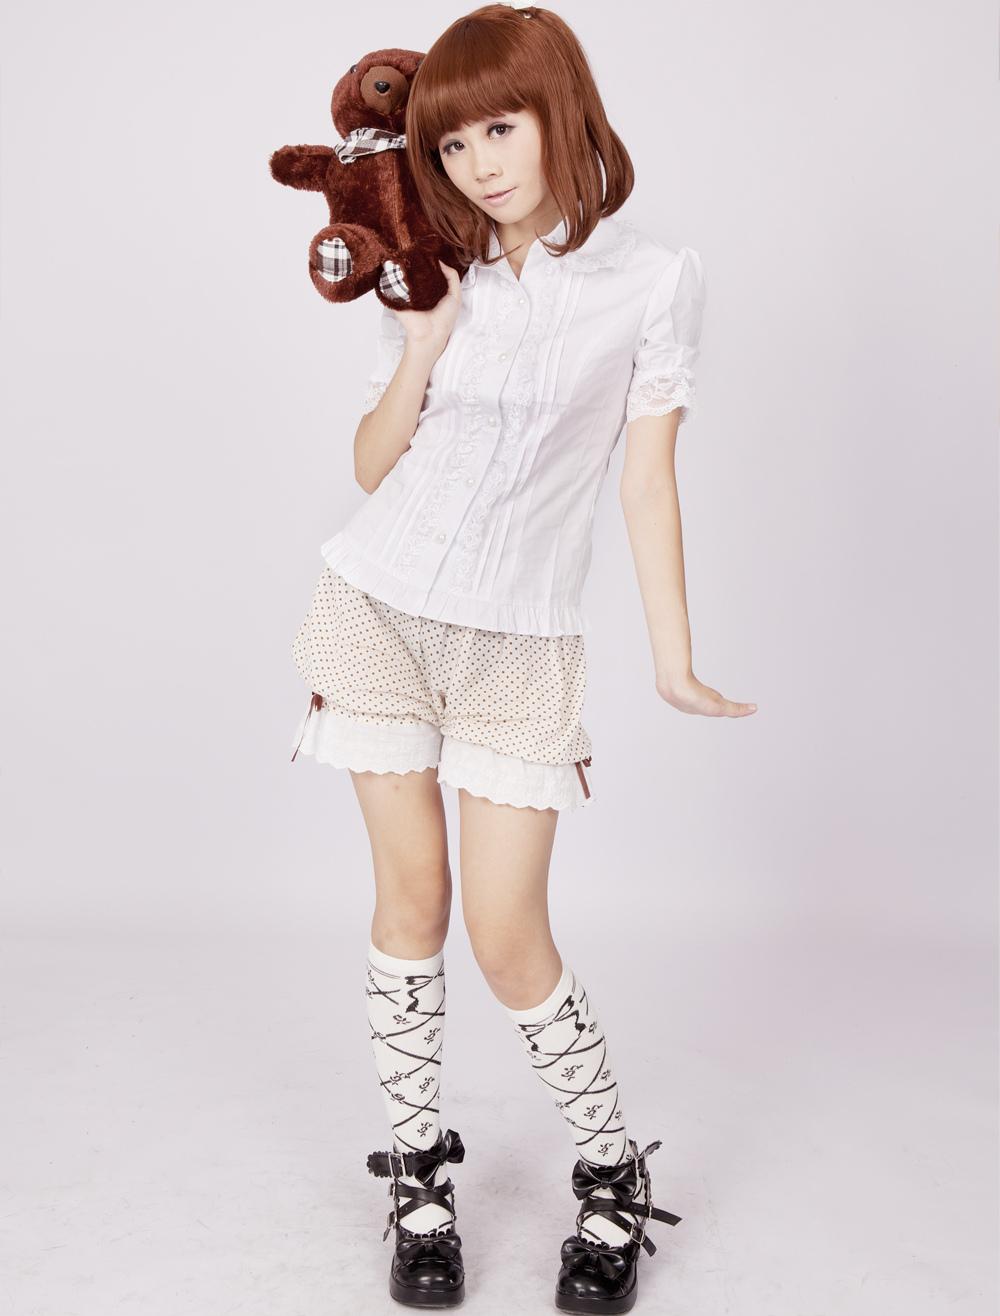 Cotton White Short Sleeves Lace Ruffles Cotton Lolita Blouse